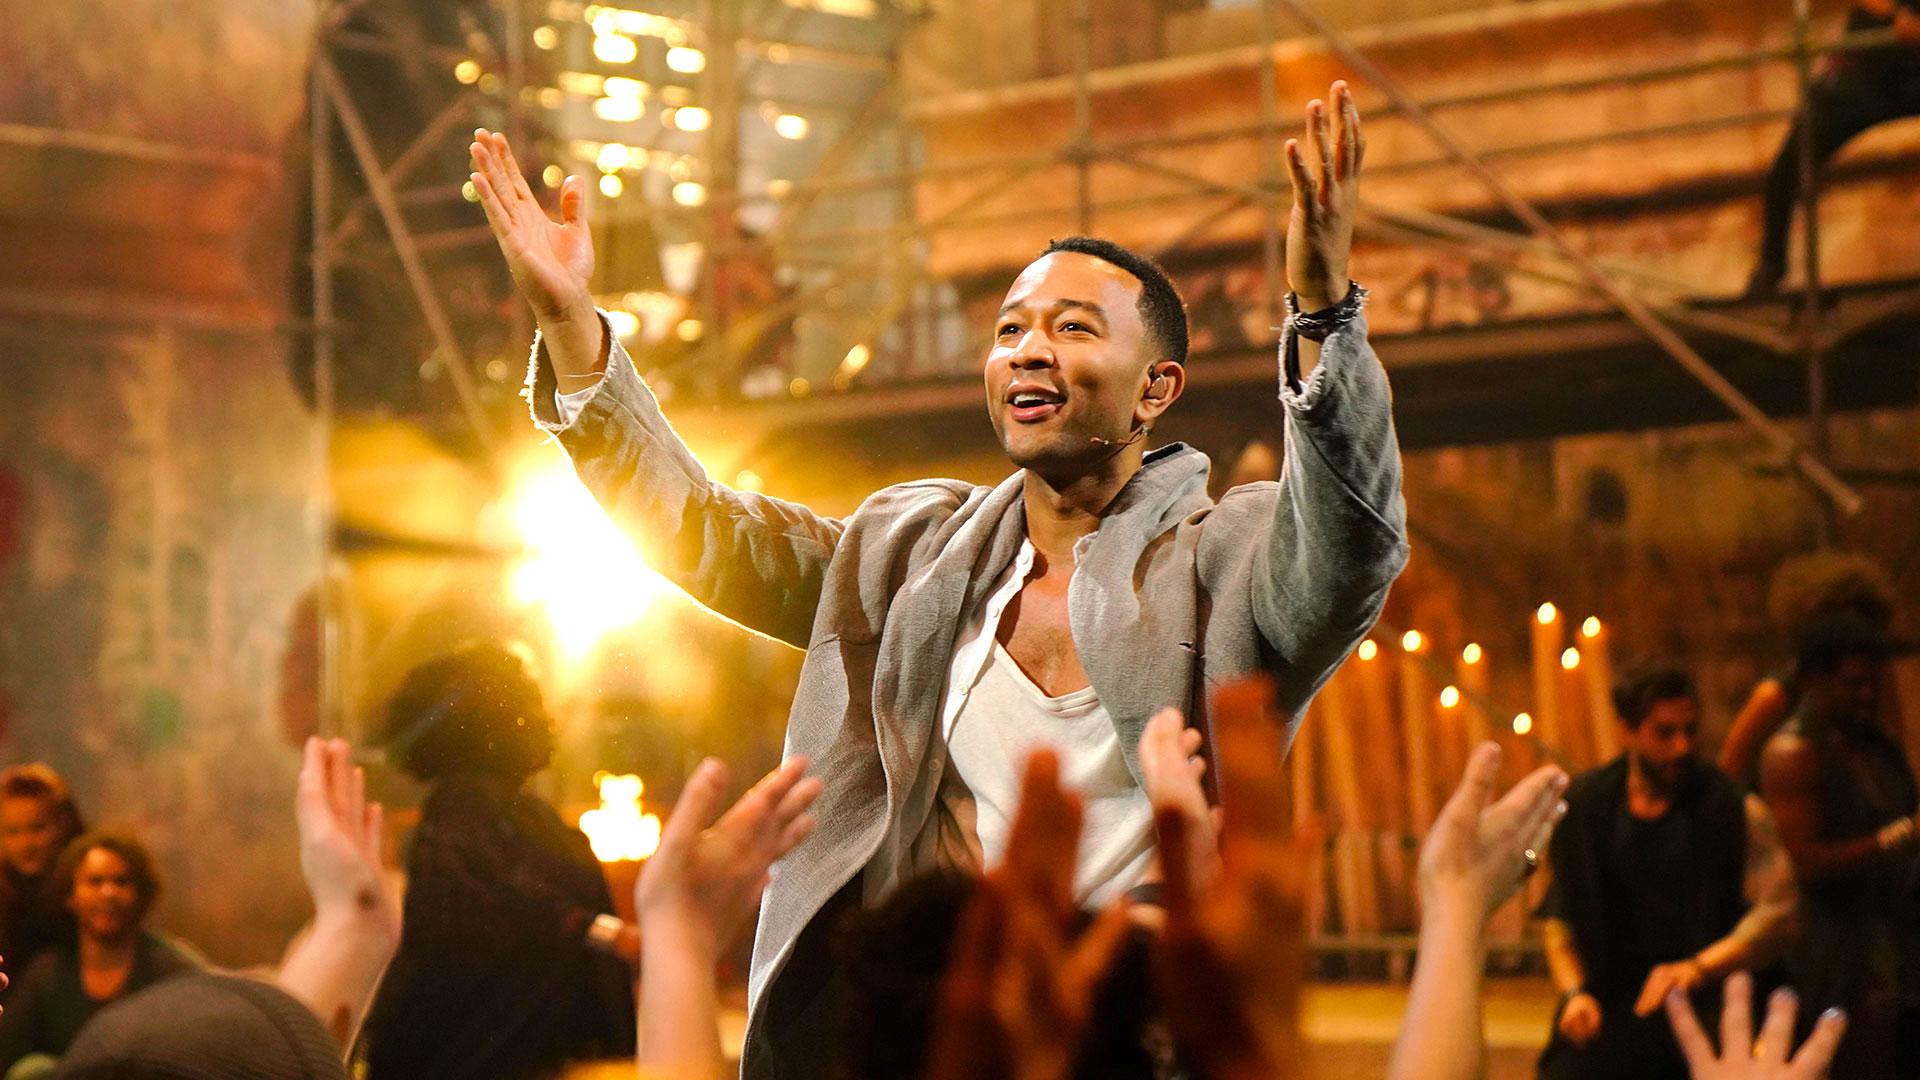 Watch Jesus Christ Superstar Live in Concert Episode: Jesus Christ Superstar Live in Concert ...